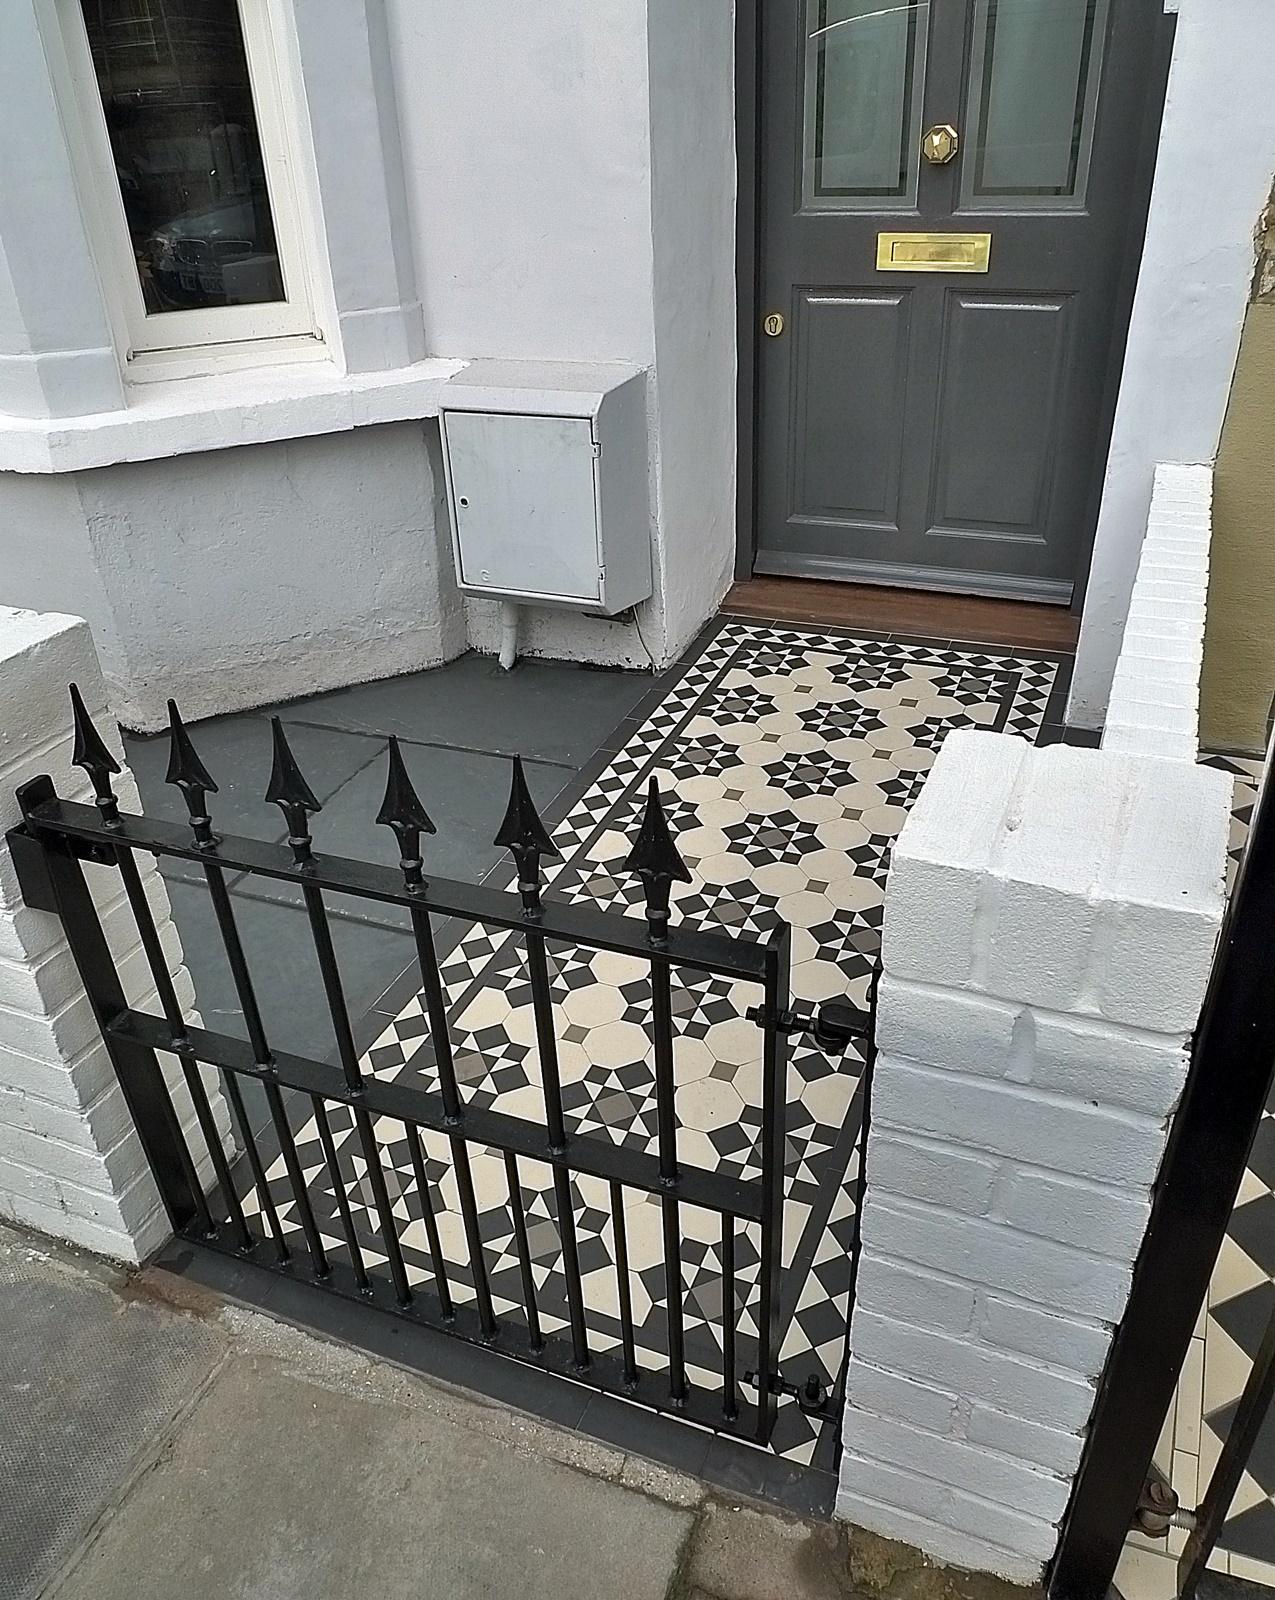 Victorian Mosaic London Battersea Wandsworth Fulham Chelsea Balham